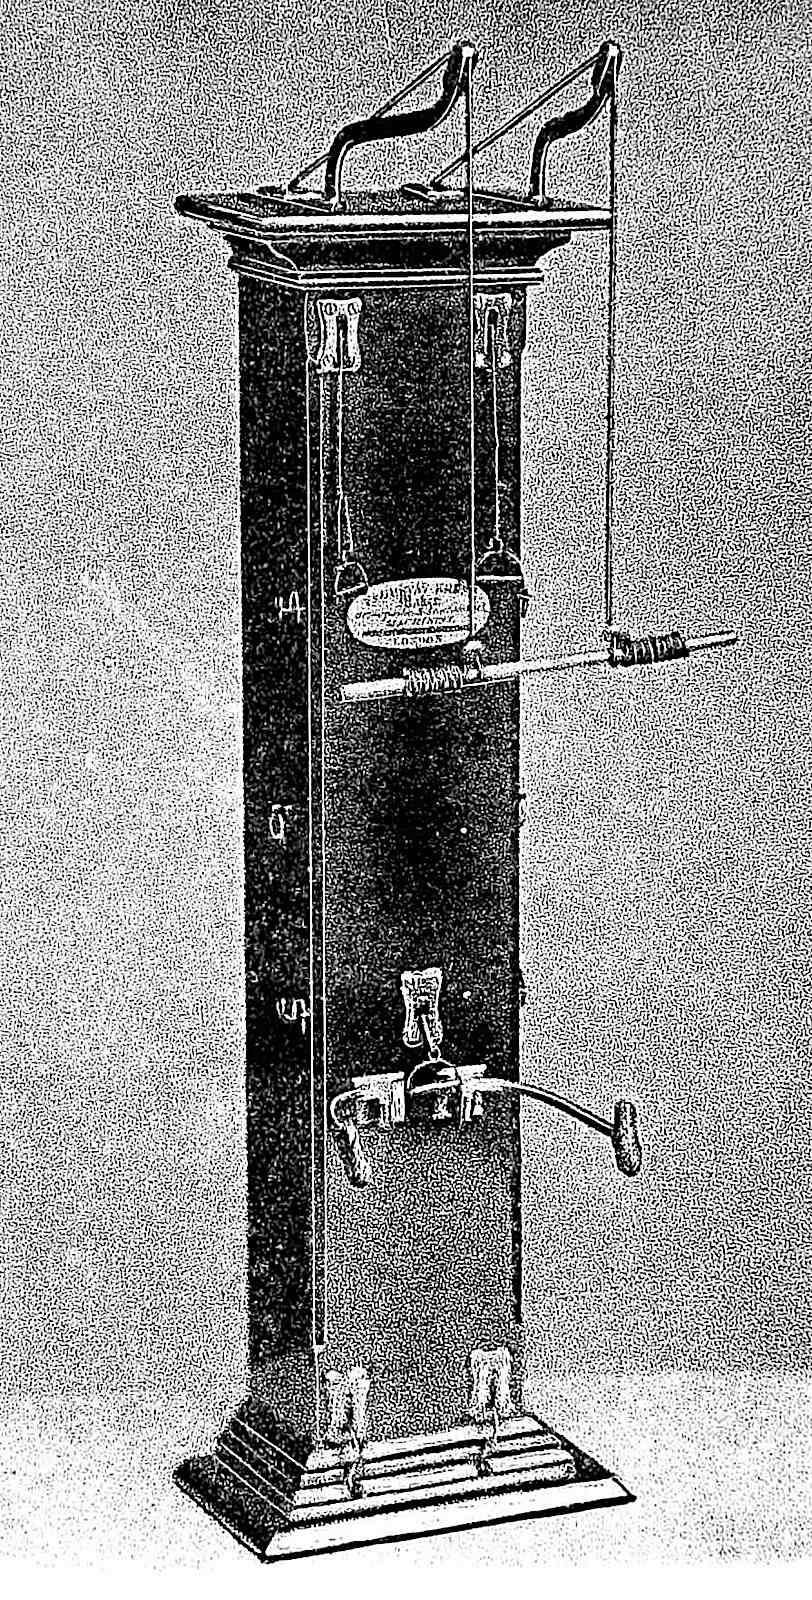 a compact portable 1883 gymnasium photograph, Monty Burns